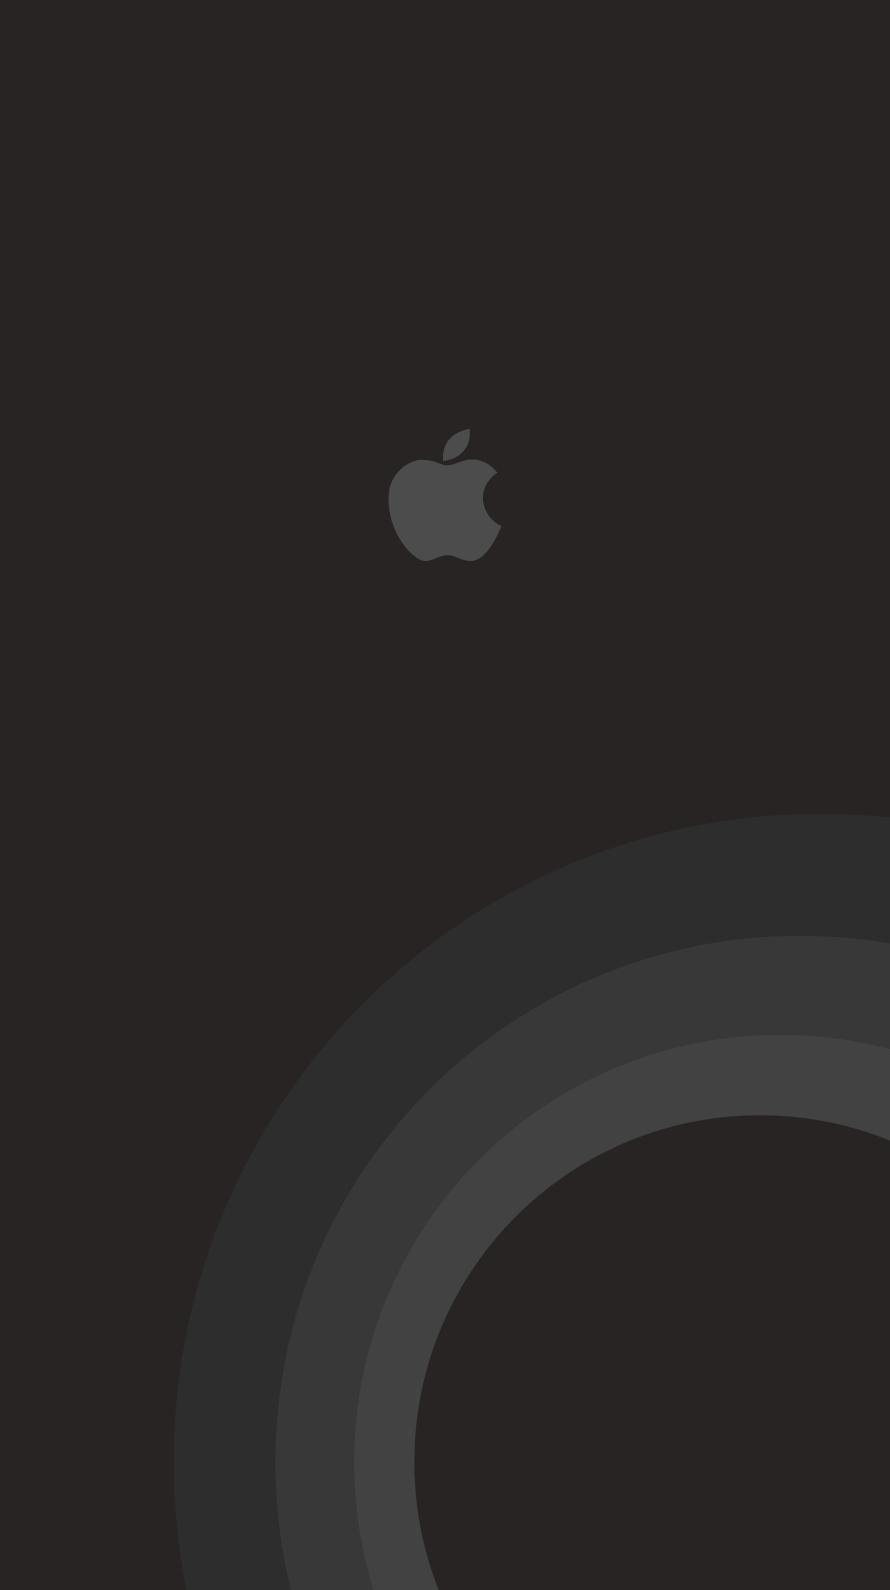 iPhone7, 6, 5用壁紙 Appleロゴ モノクロ 1